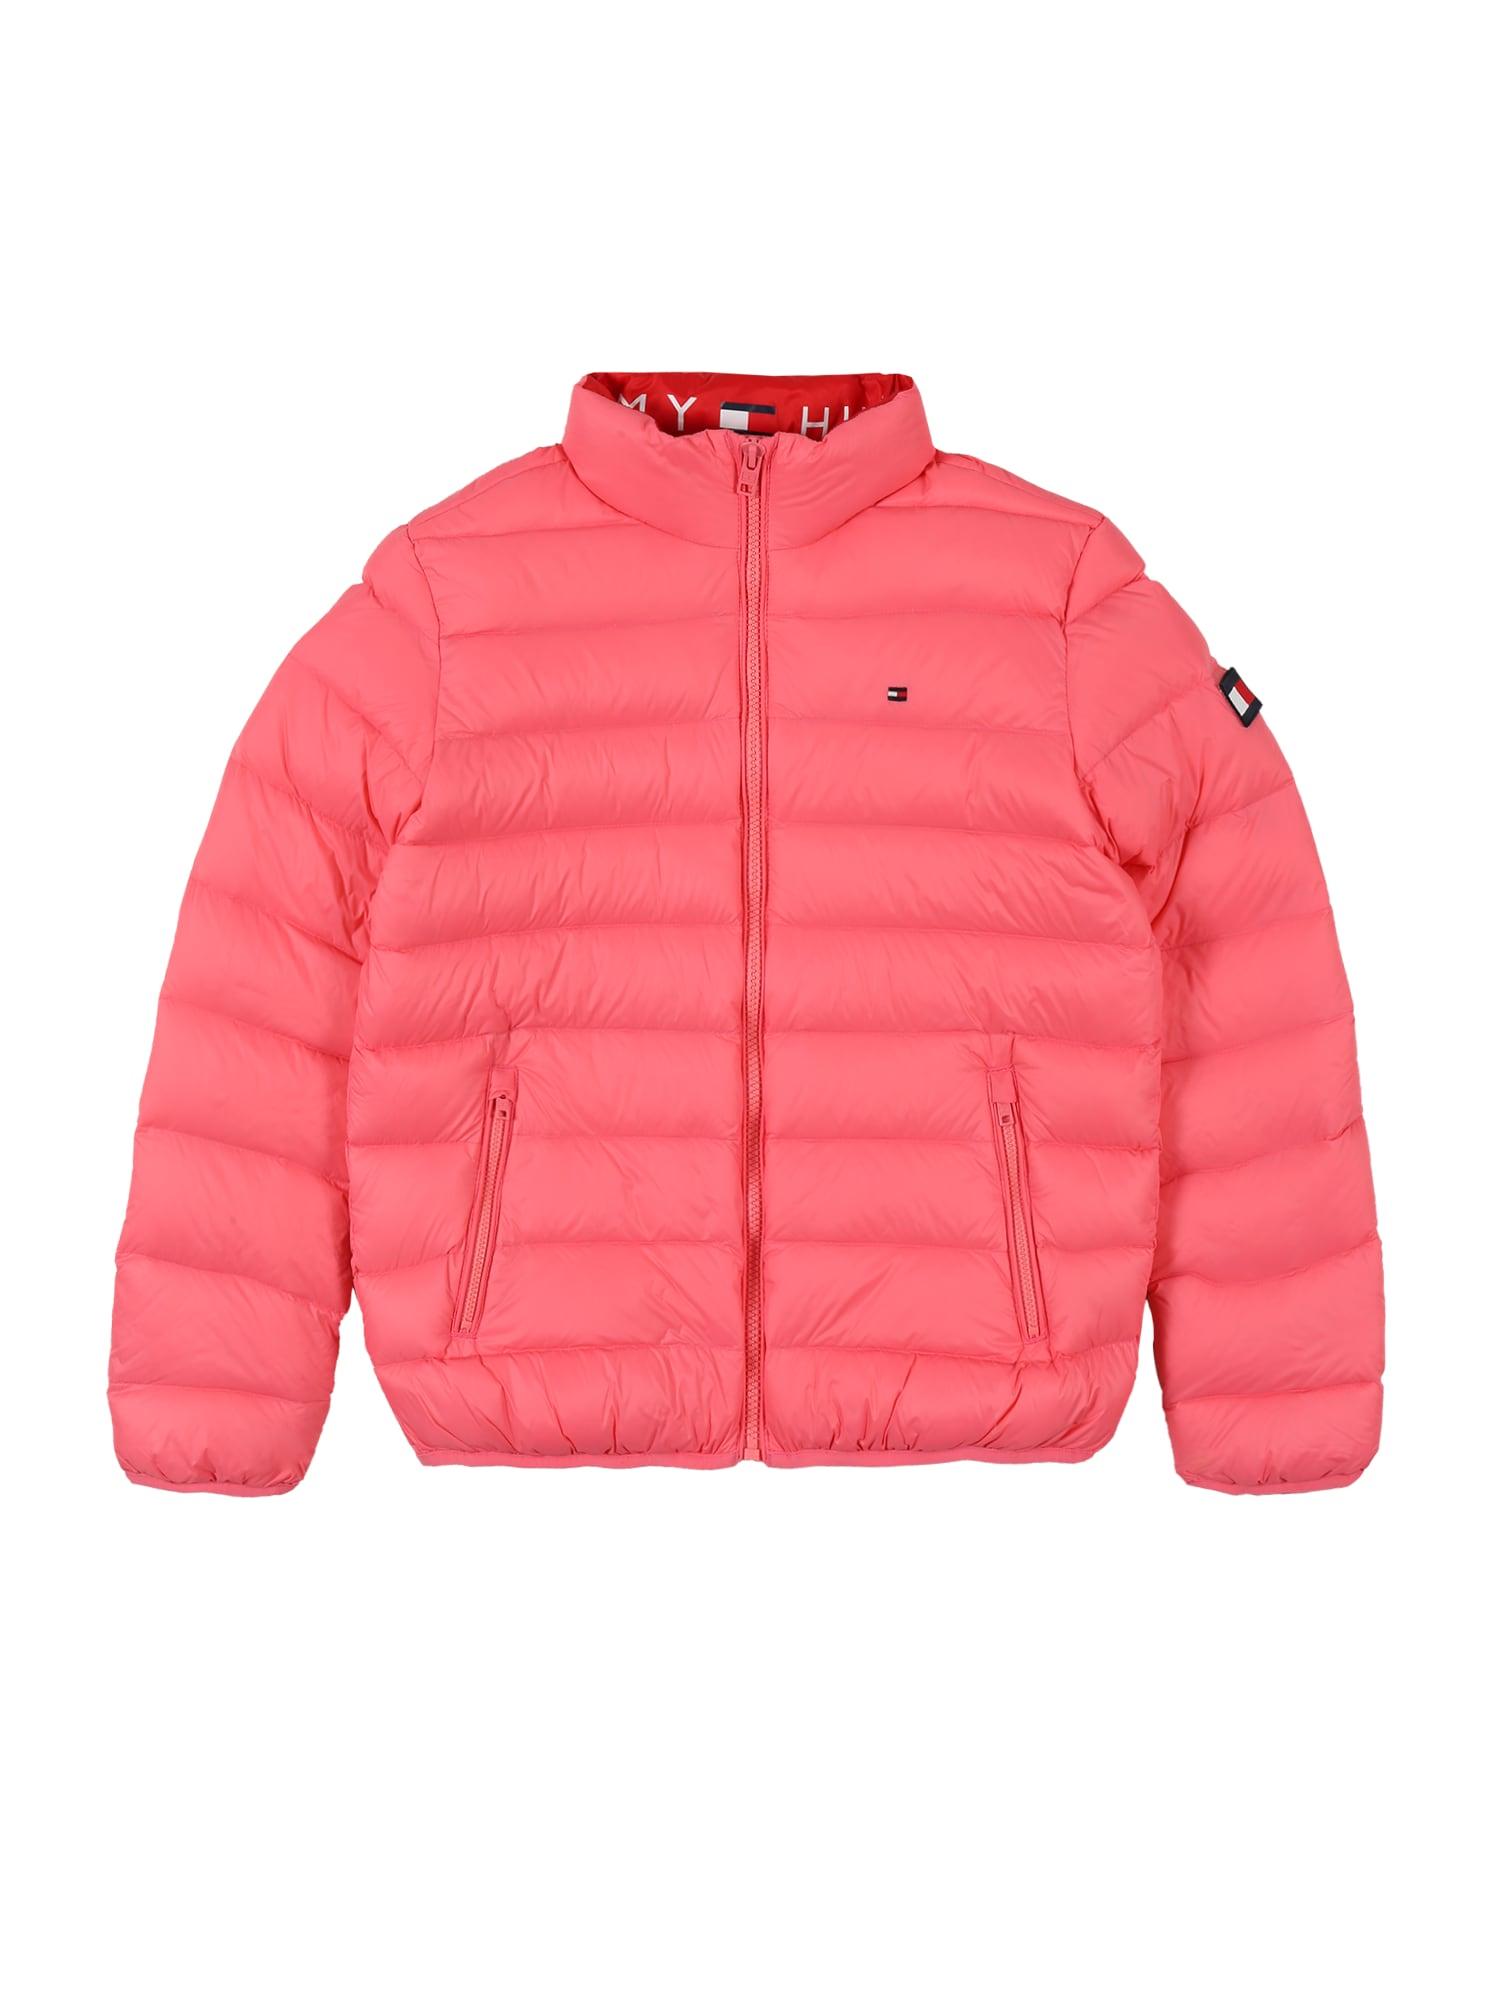 TOMMY HILFIGER Prechodná bunda  ružová